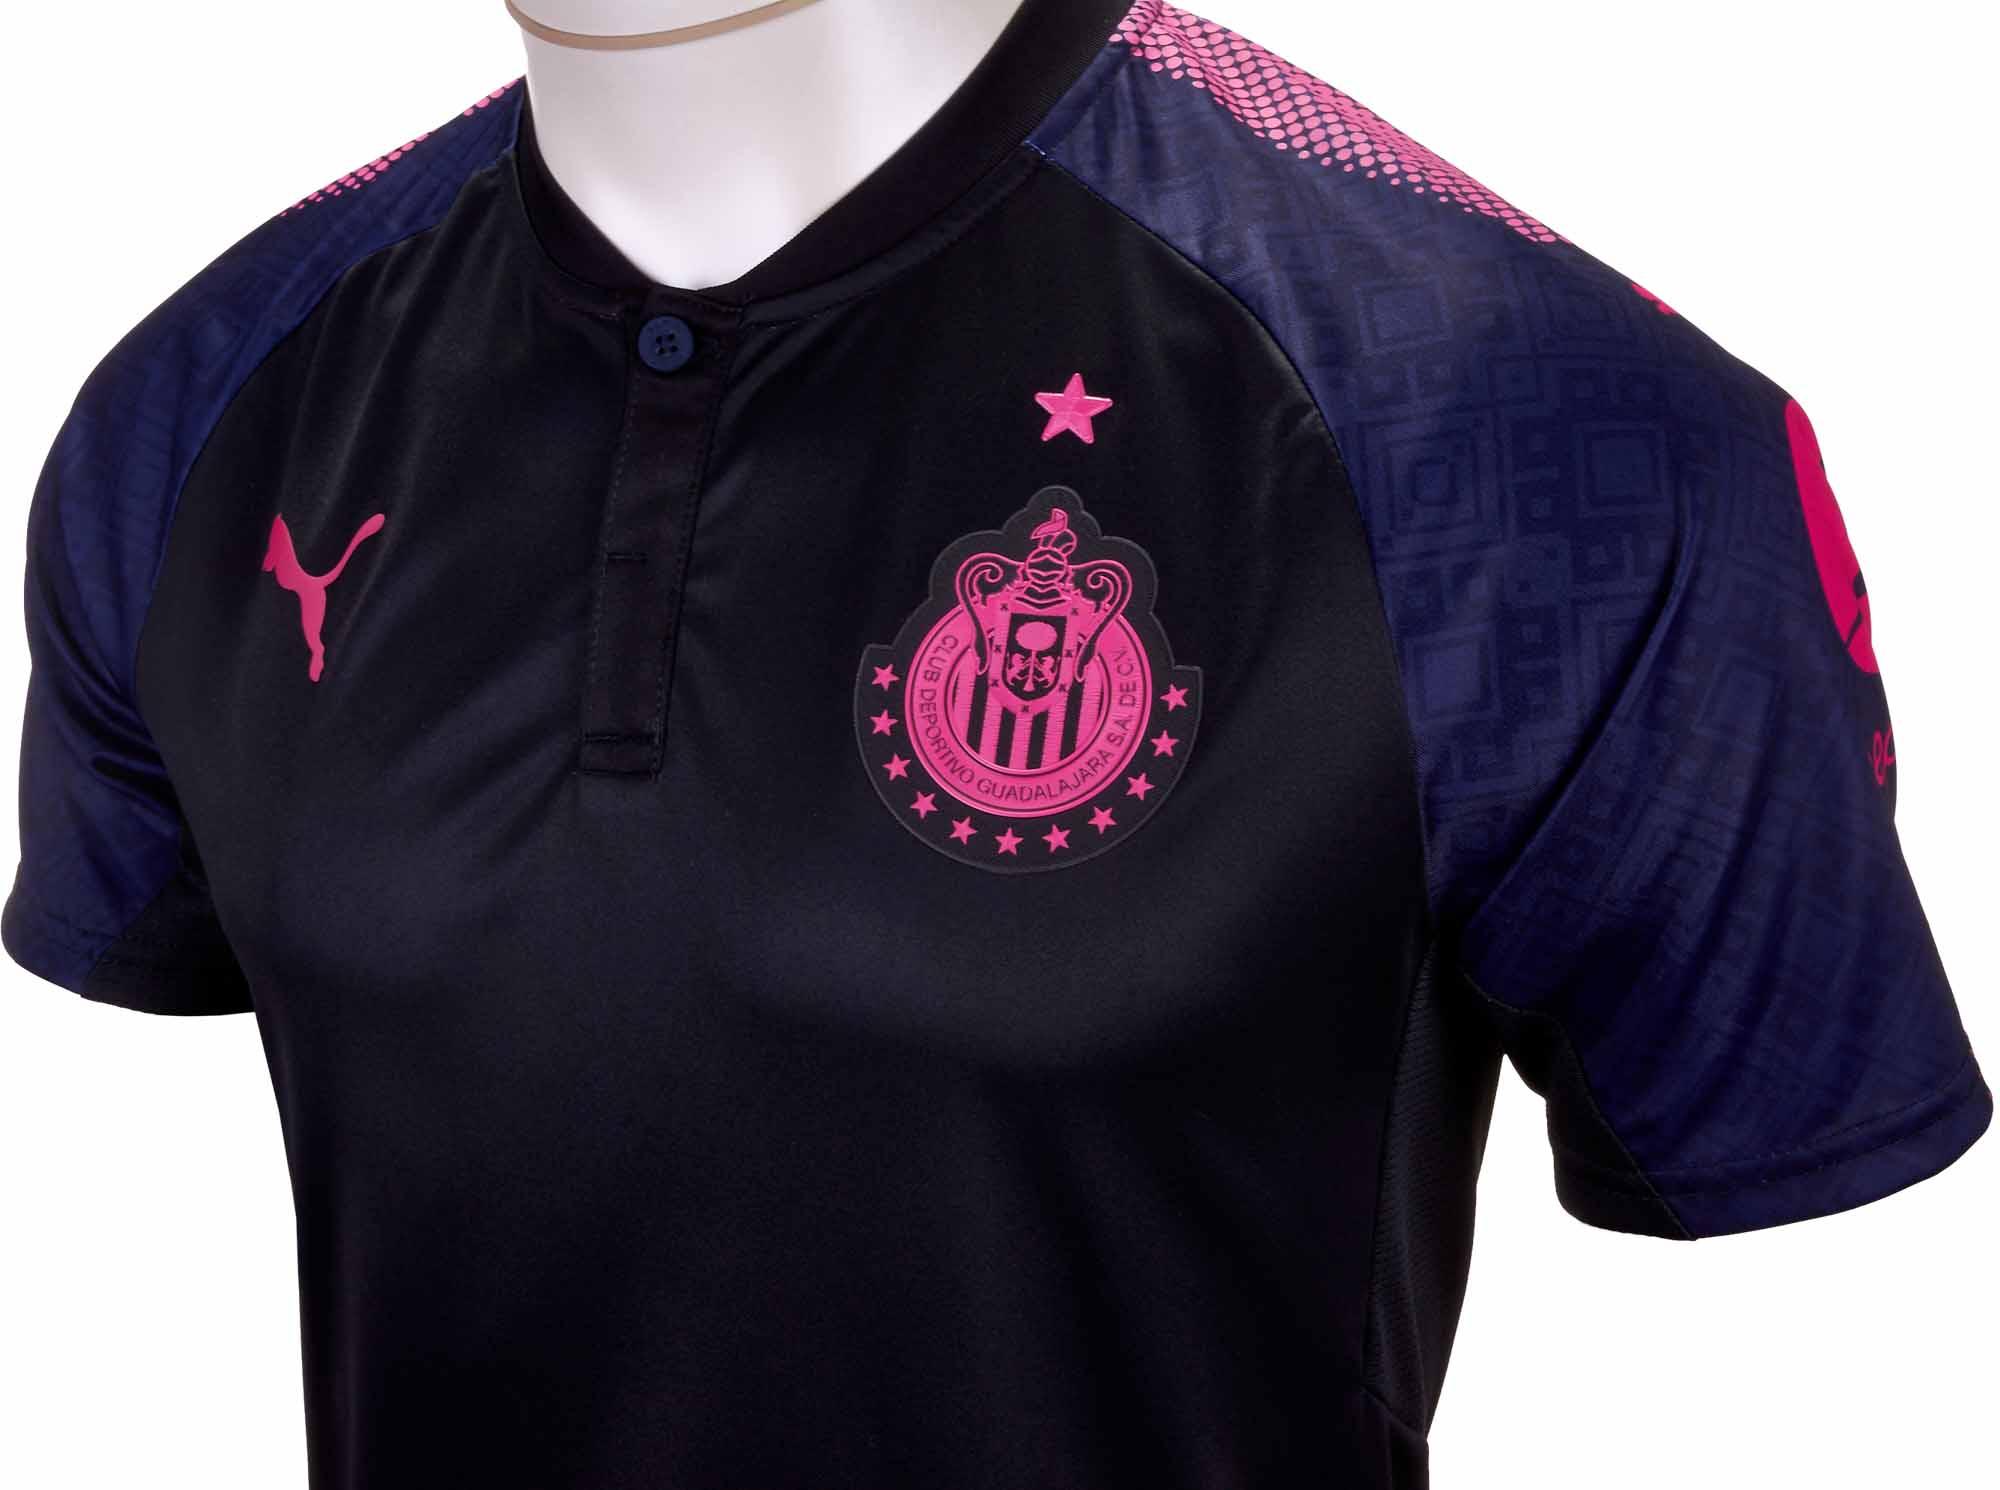 wholesale dealer 66849 e0348 2017 Puma Chivas Limited Edition Jersey - SoccerPro.com